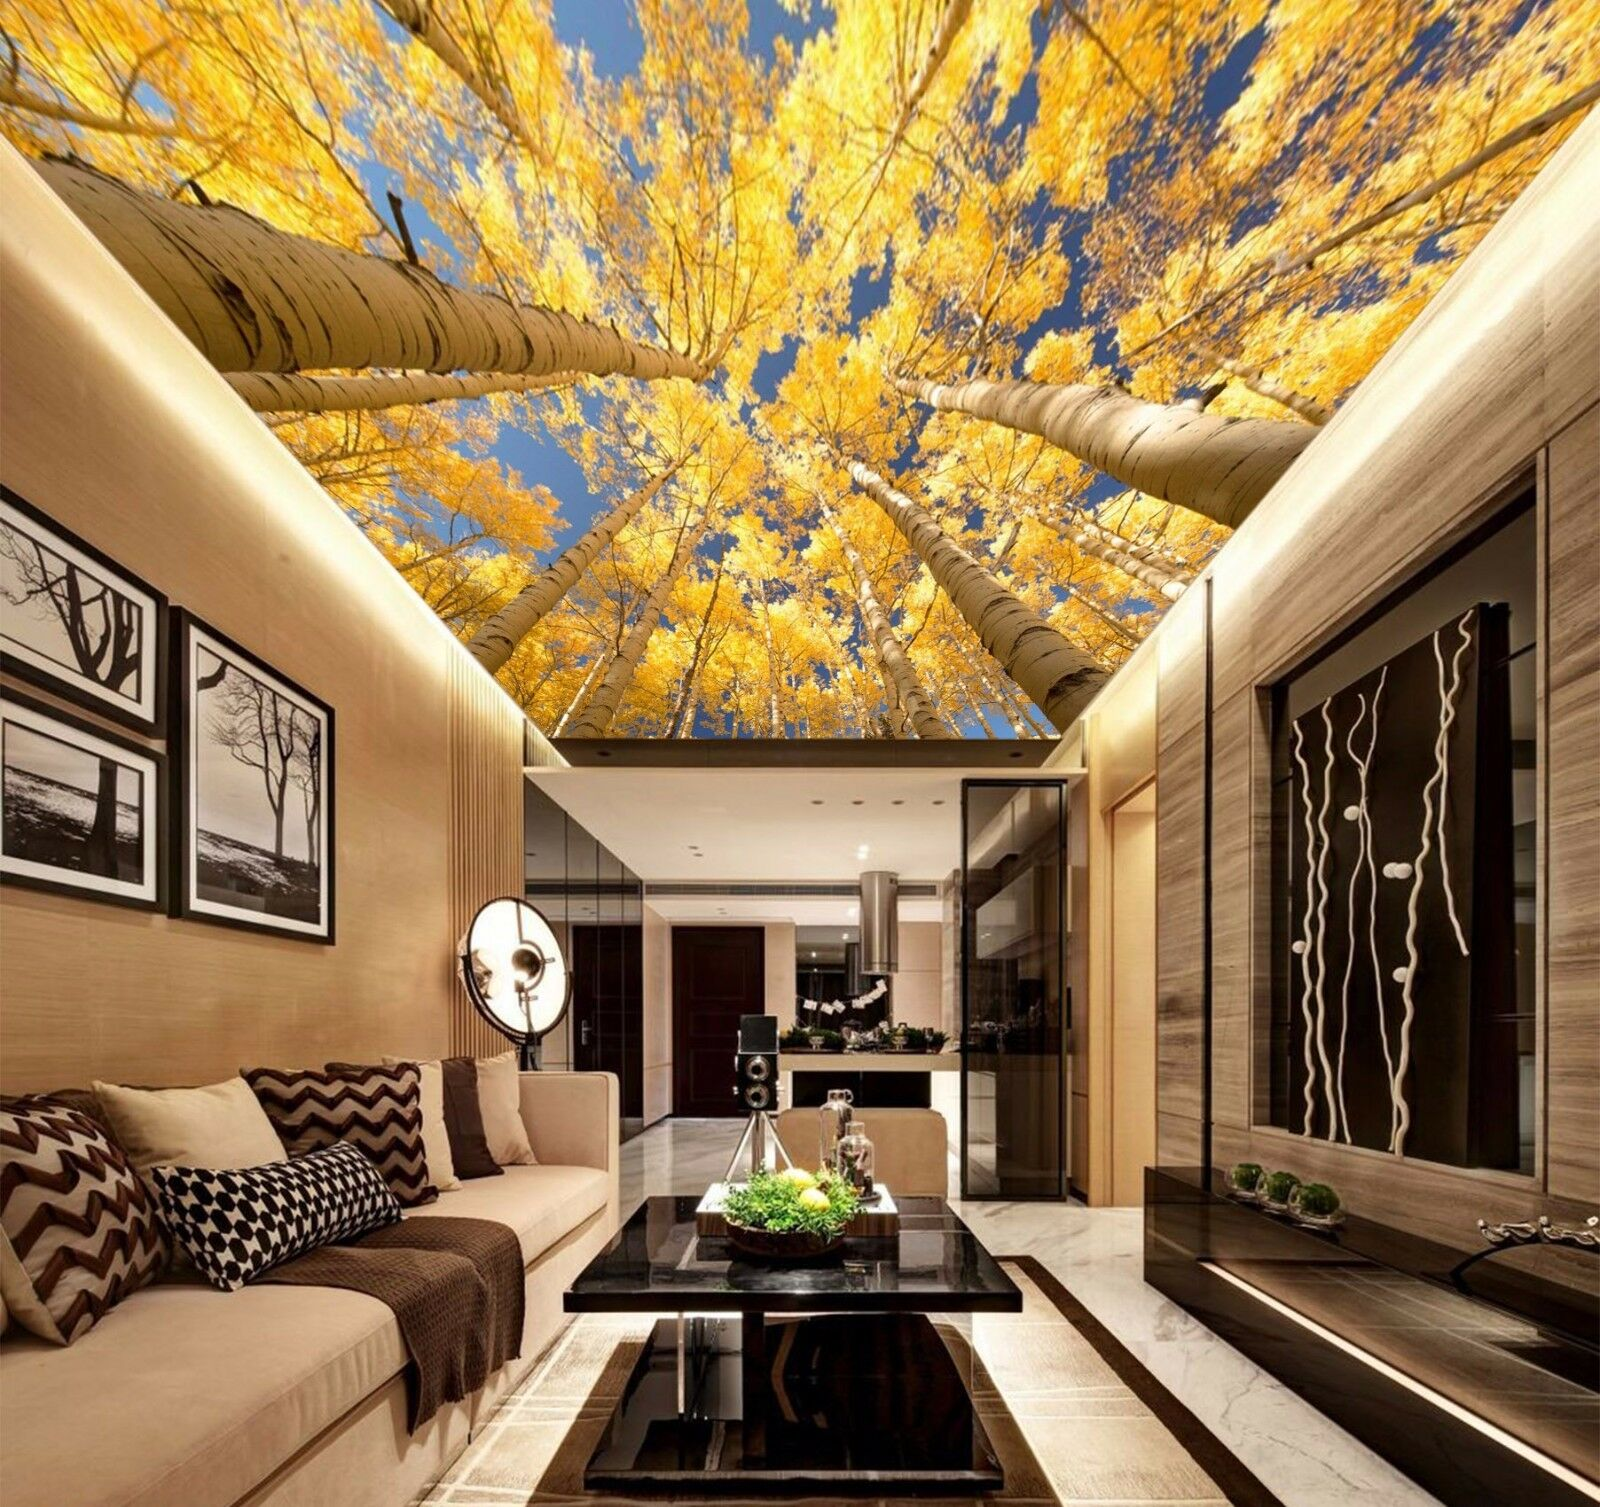 3D Sunshine Grove 73 Ceiling WallPaper Murals Wall Print Decal Deco AJ WALLPAPER